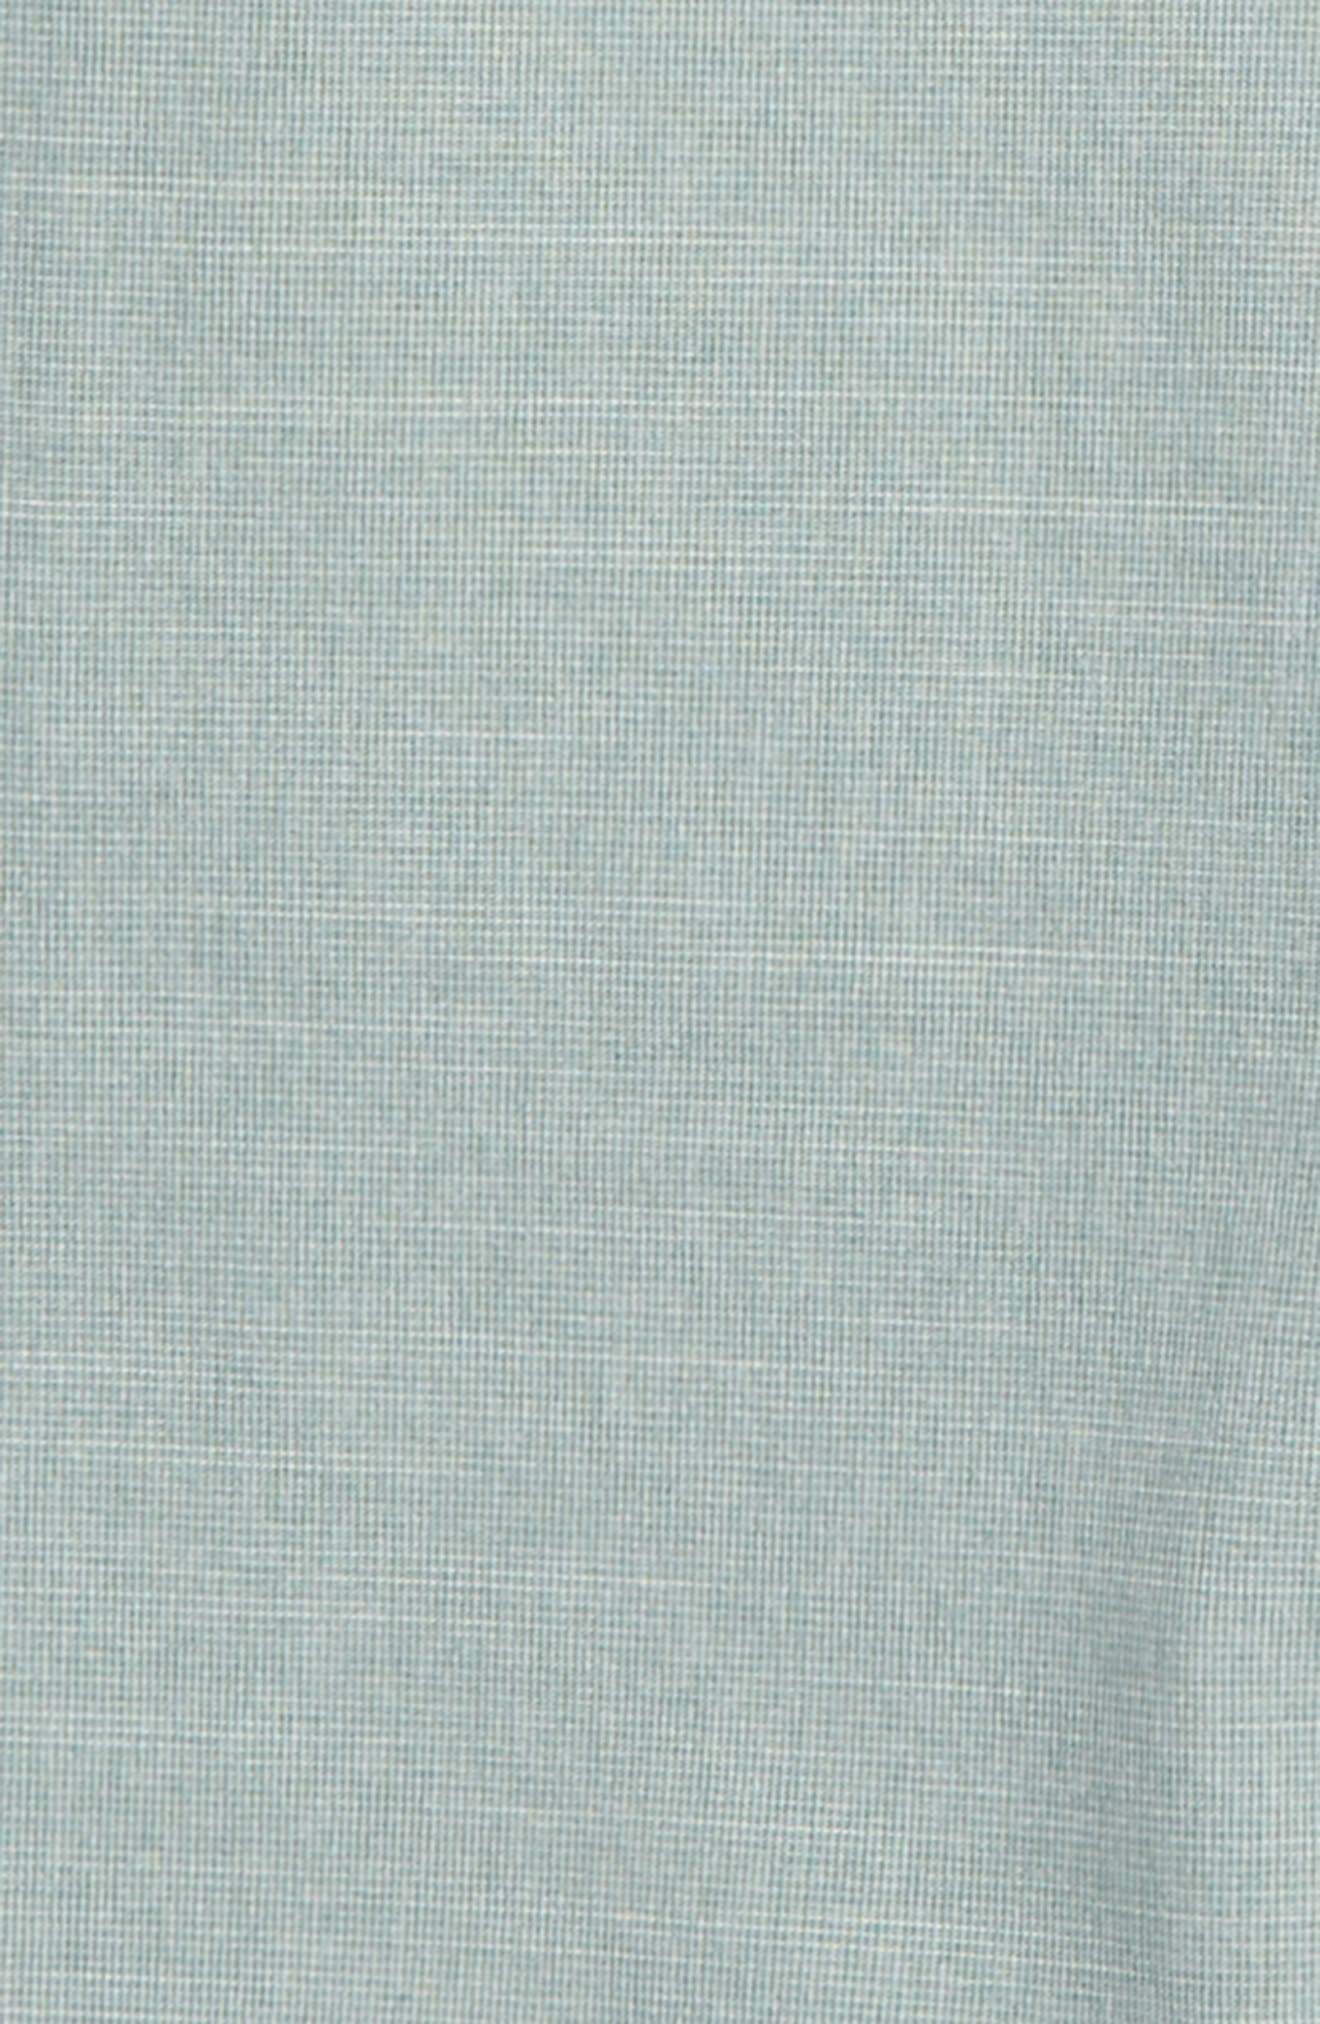 Balance Hybrid Board Shorts,                             Alternate thumbnail 2, color,                             Green Haze